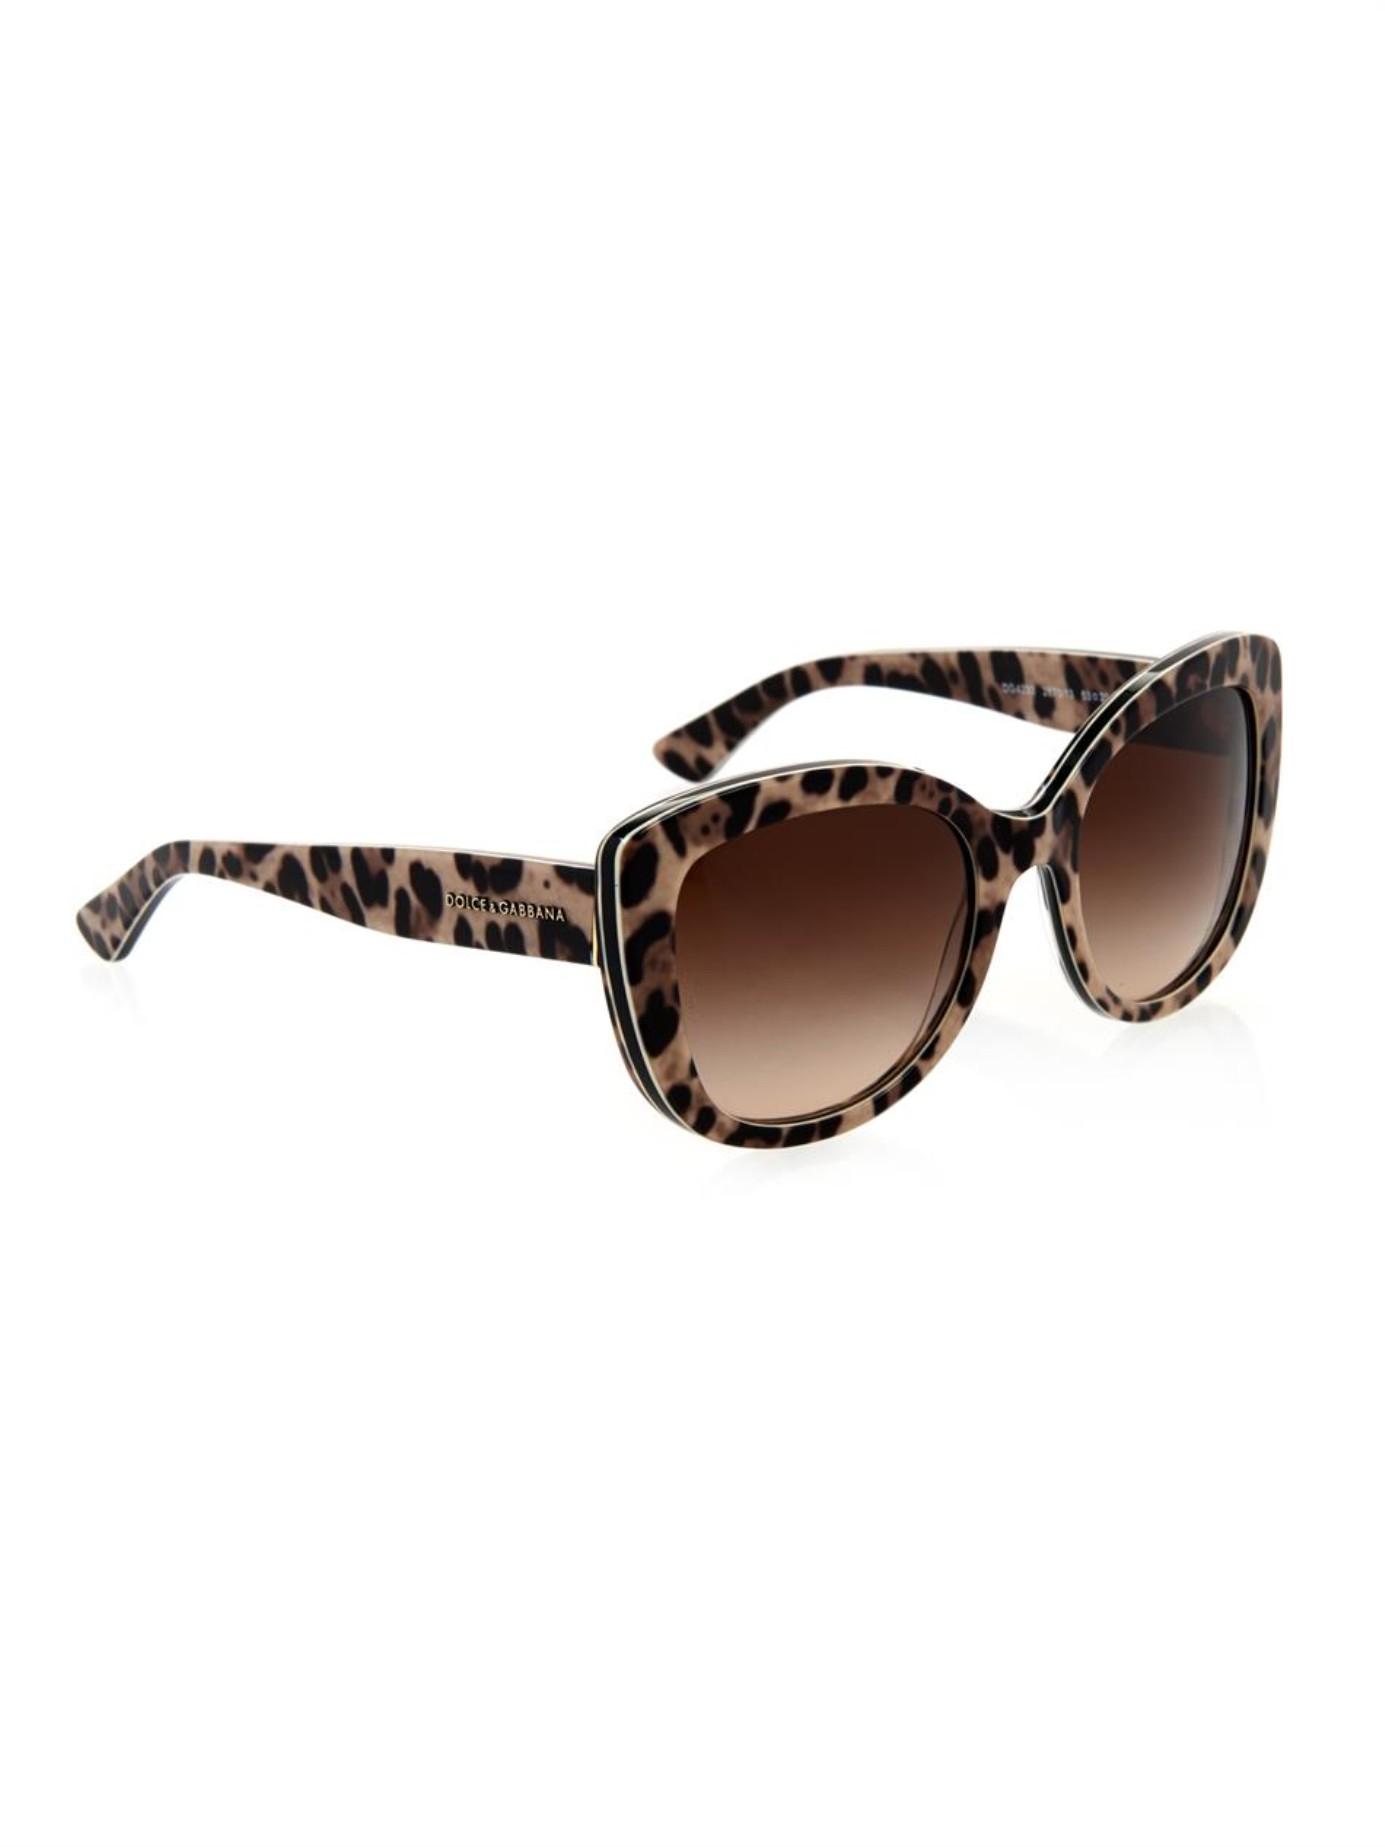 a9477b362b5 Lyst - Dolce   Gabbana Leopard-Print Cat-Eye Sunglasses